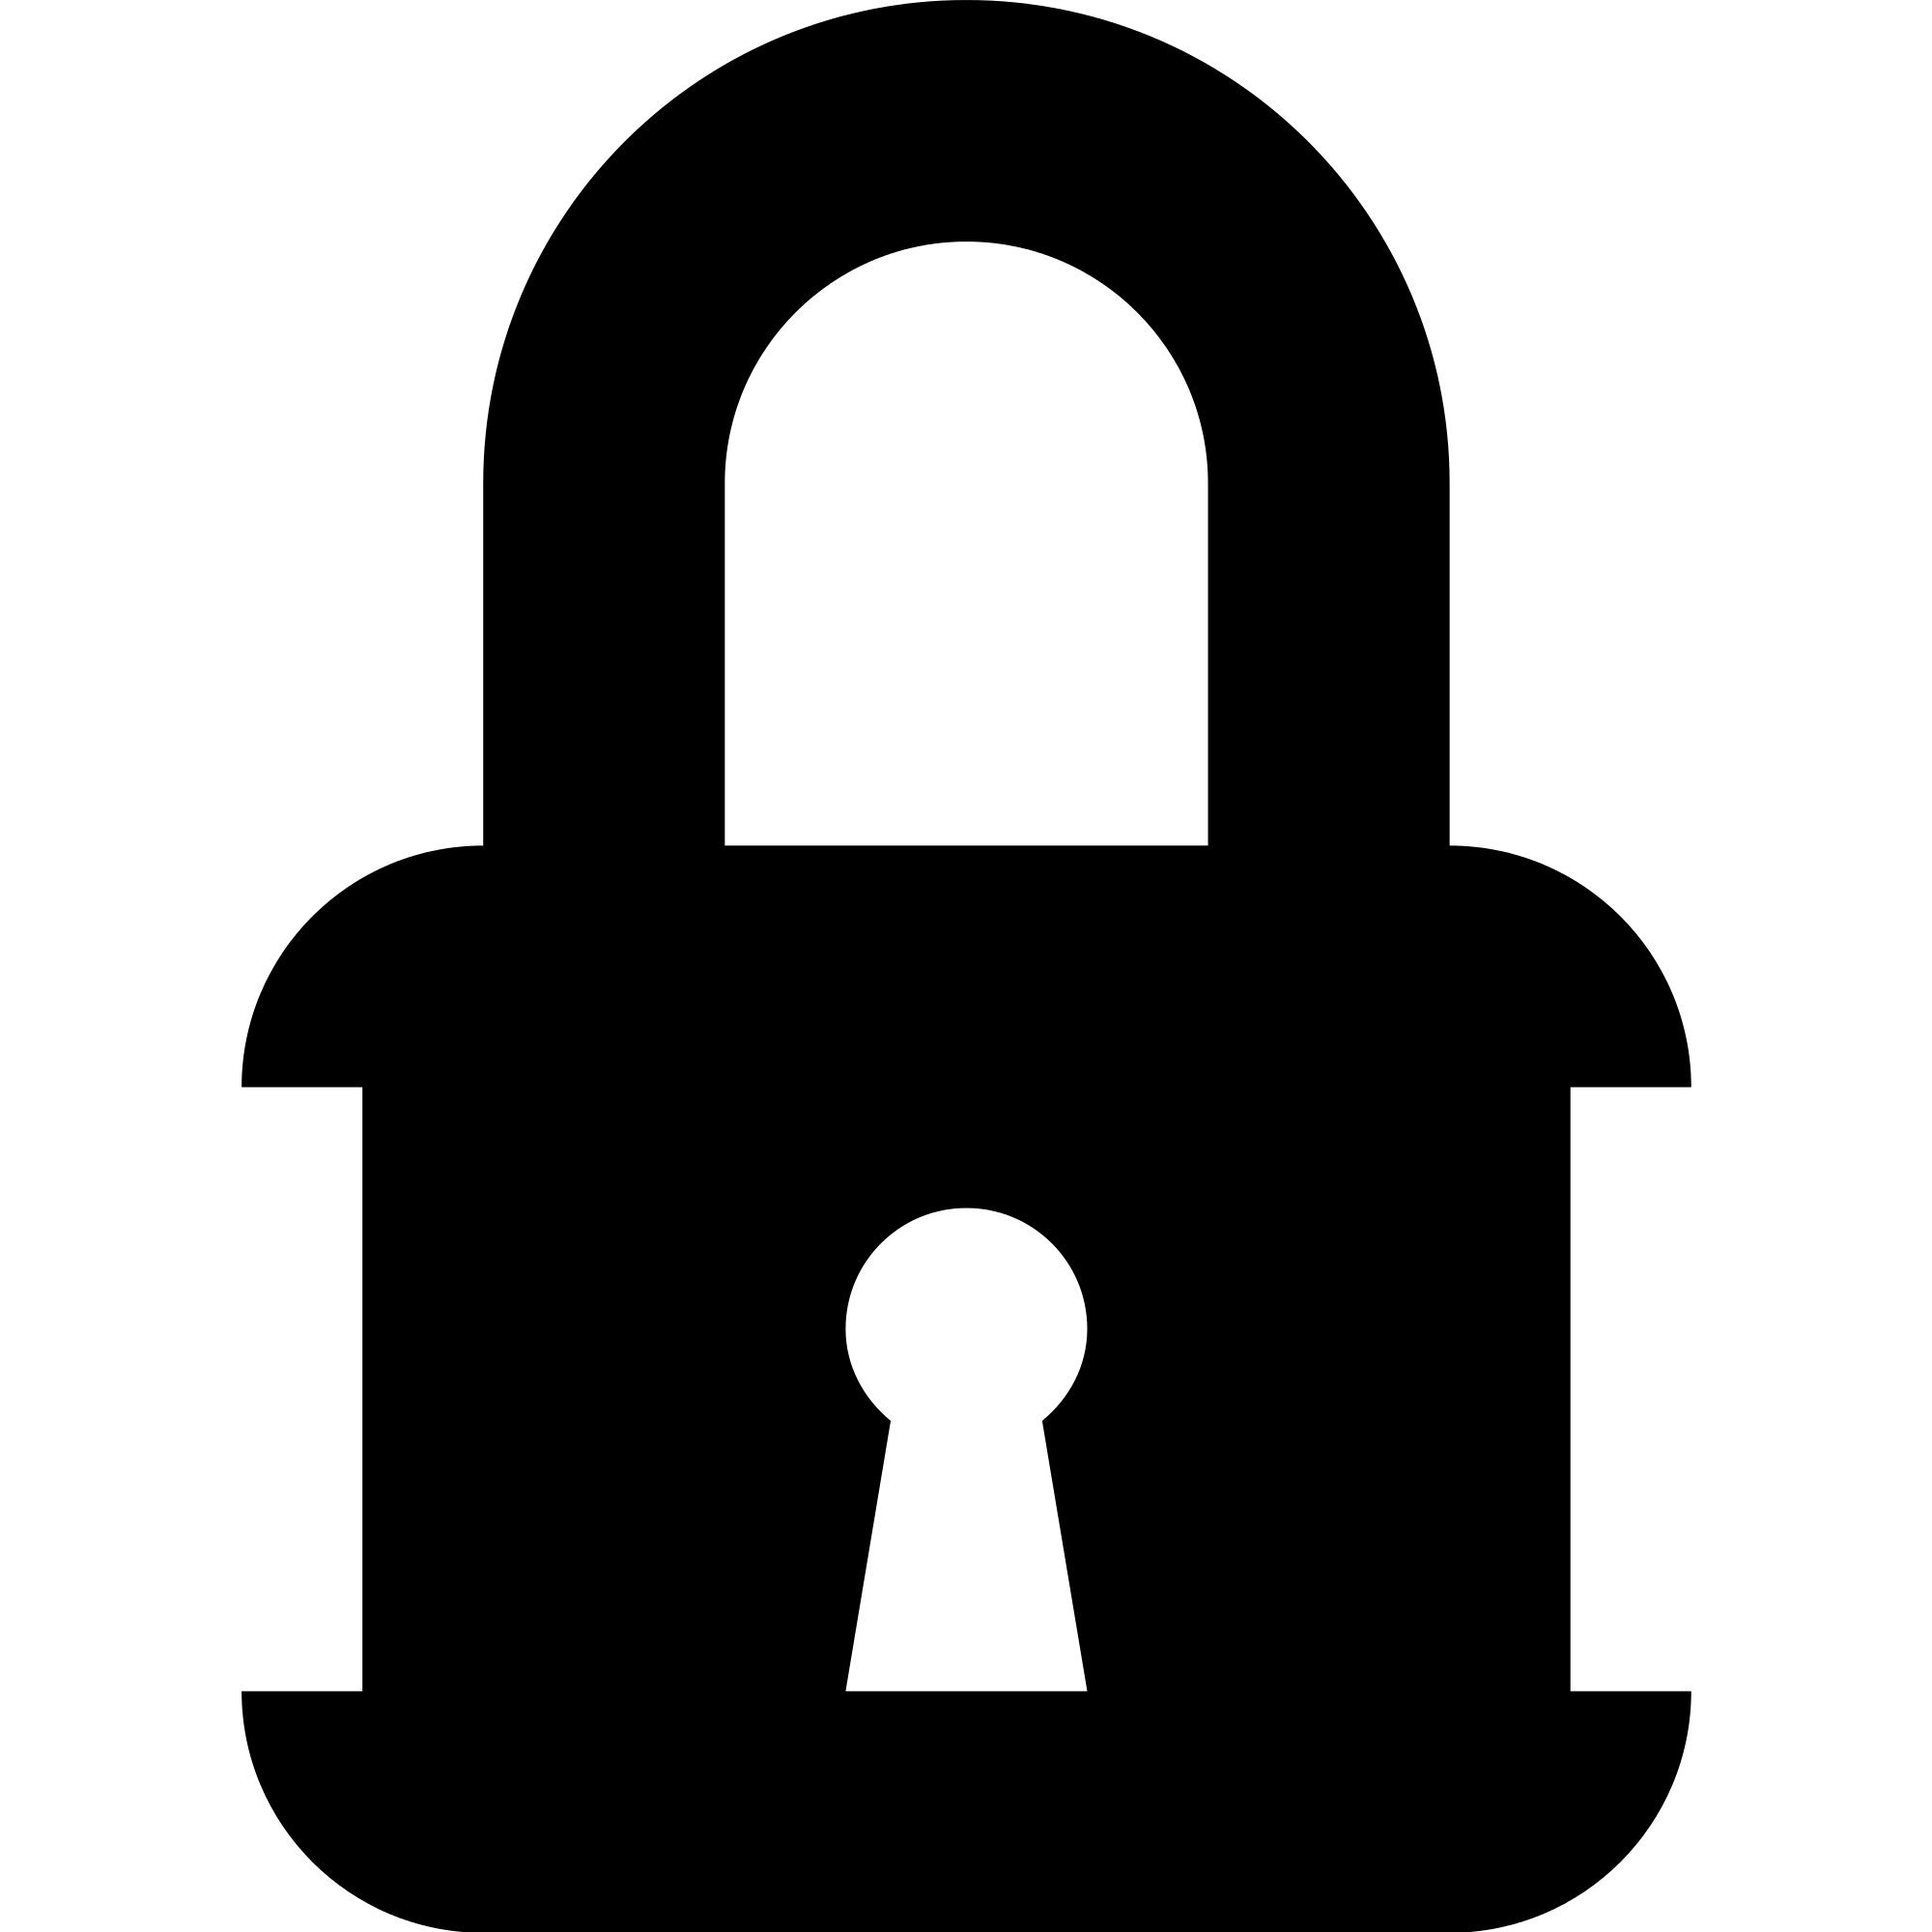 clip transparent stock keyhole vector padlock #113979209